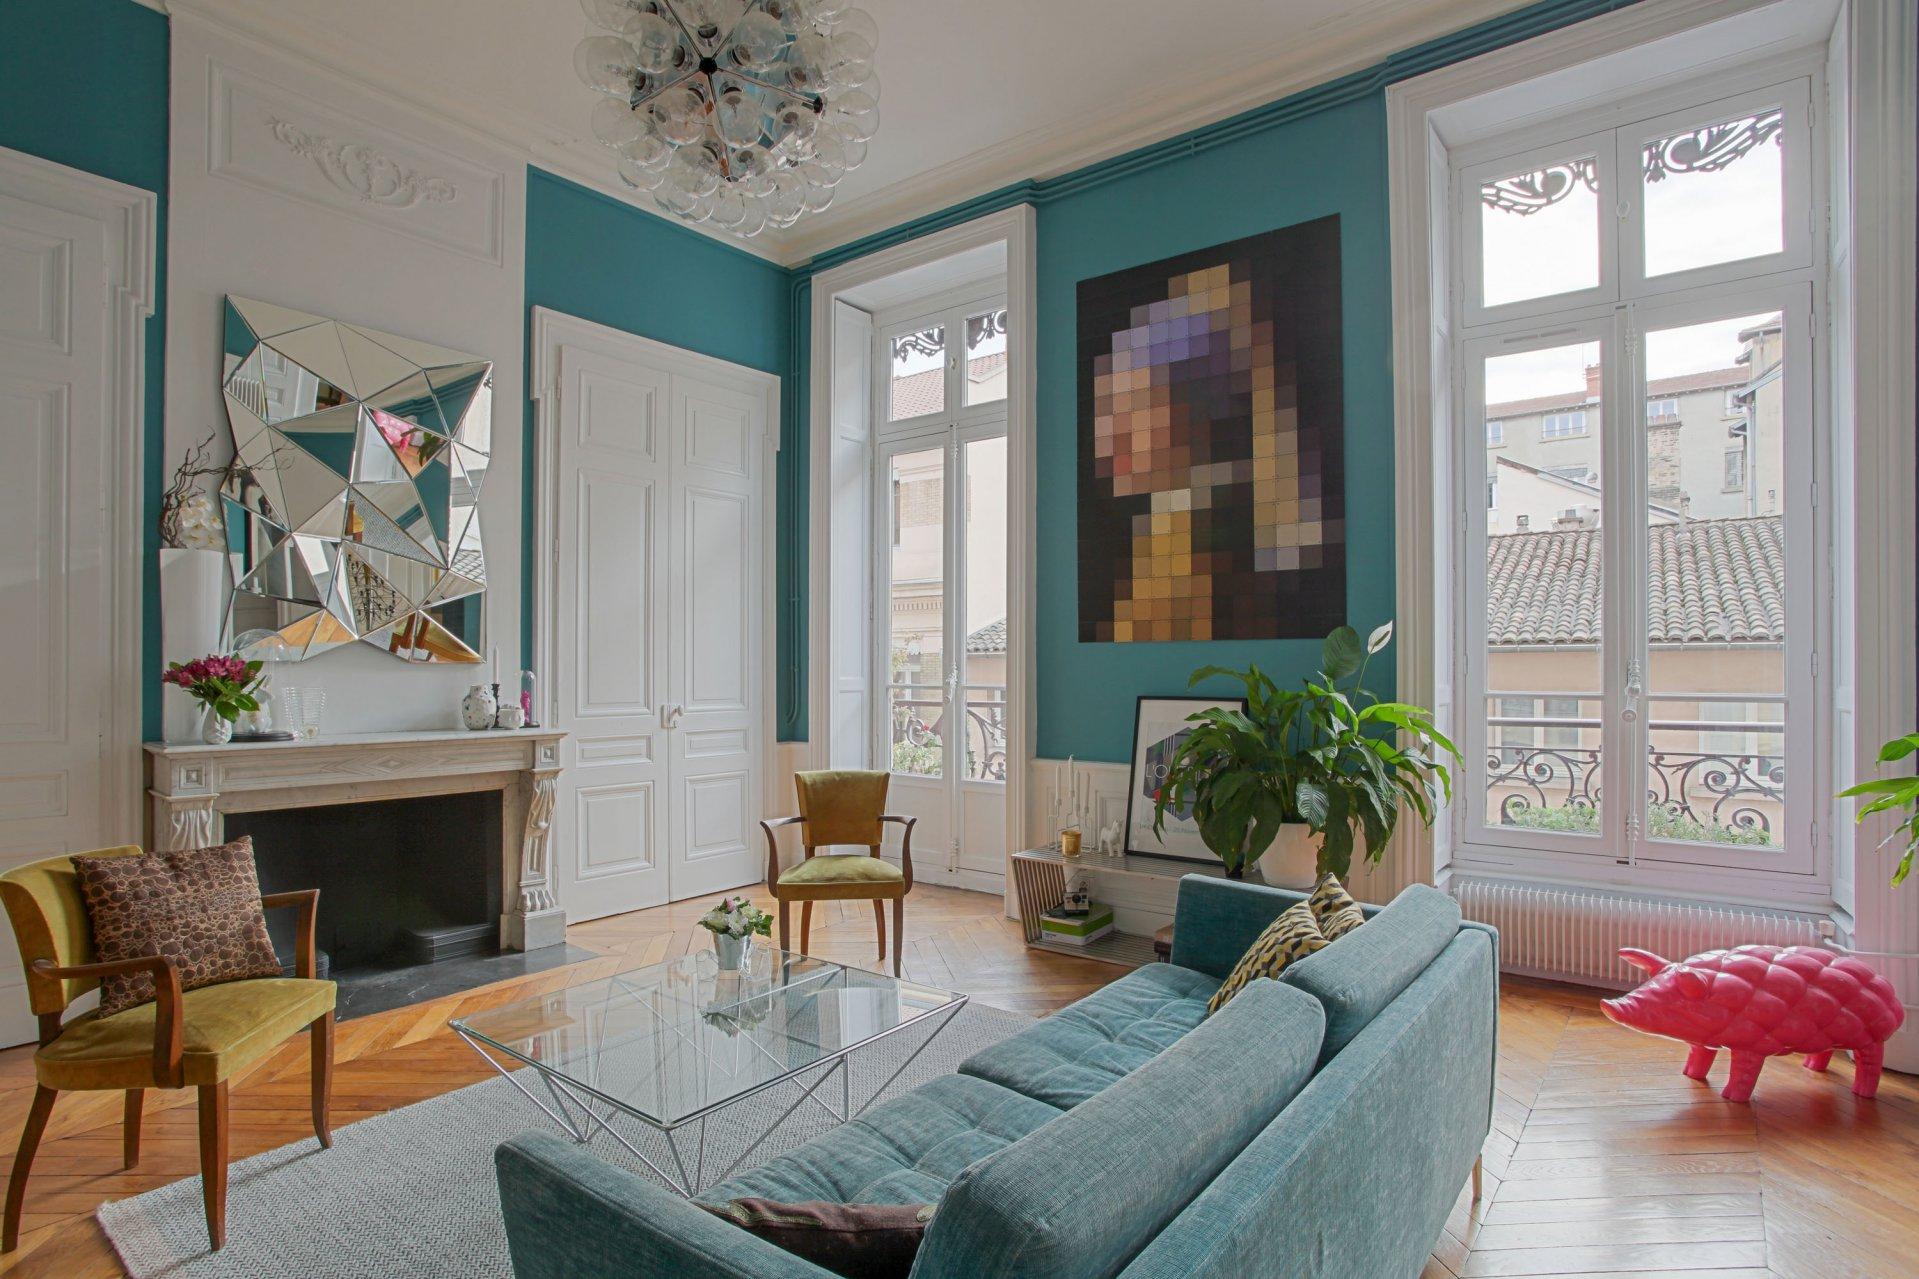 Vente Appartement Lyon 2ème Ainay